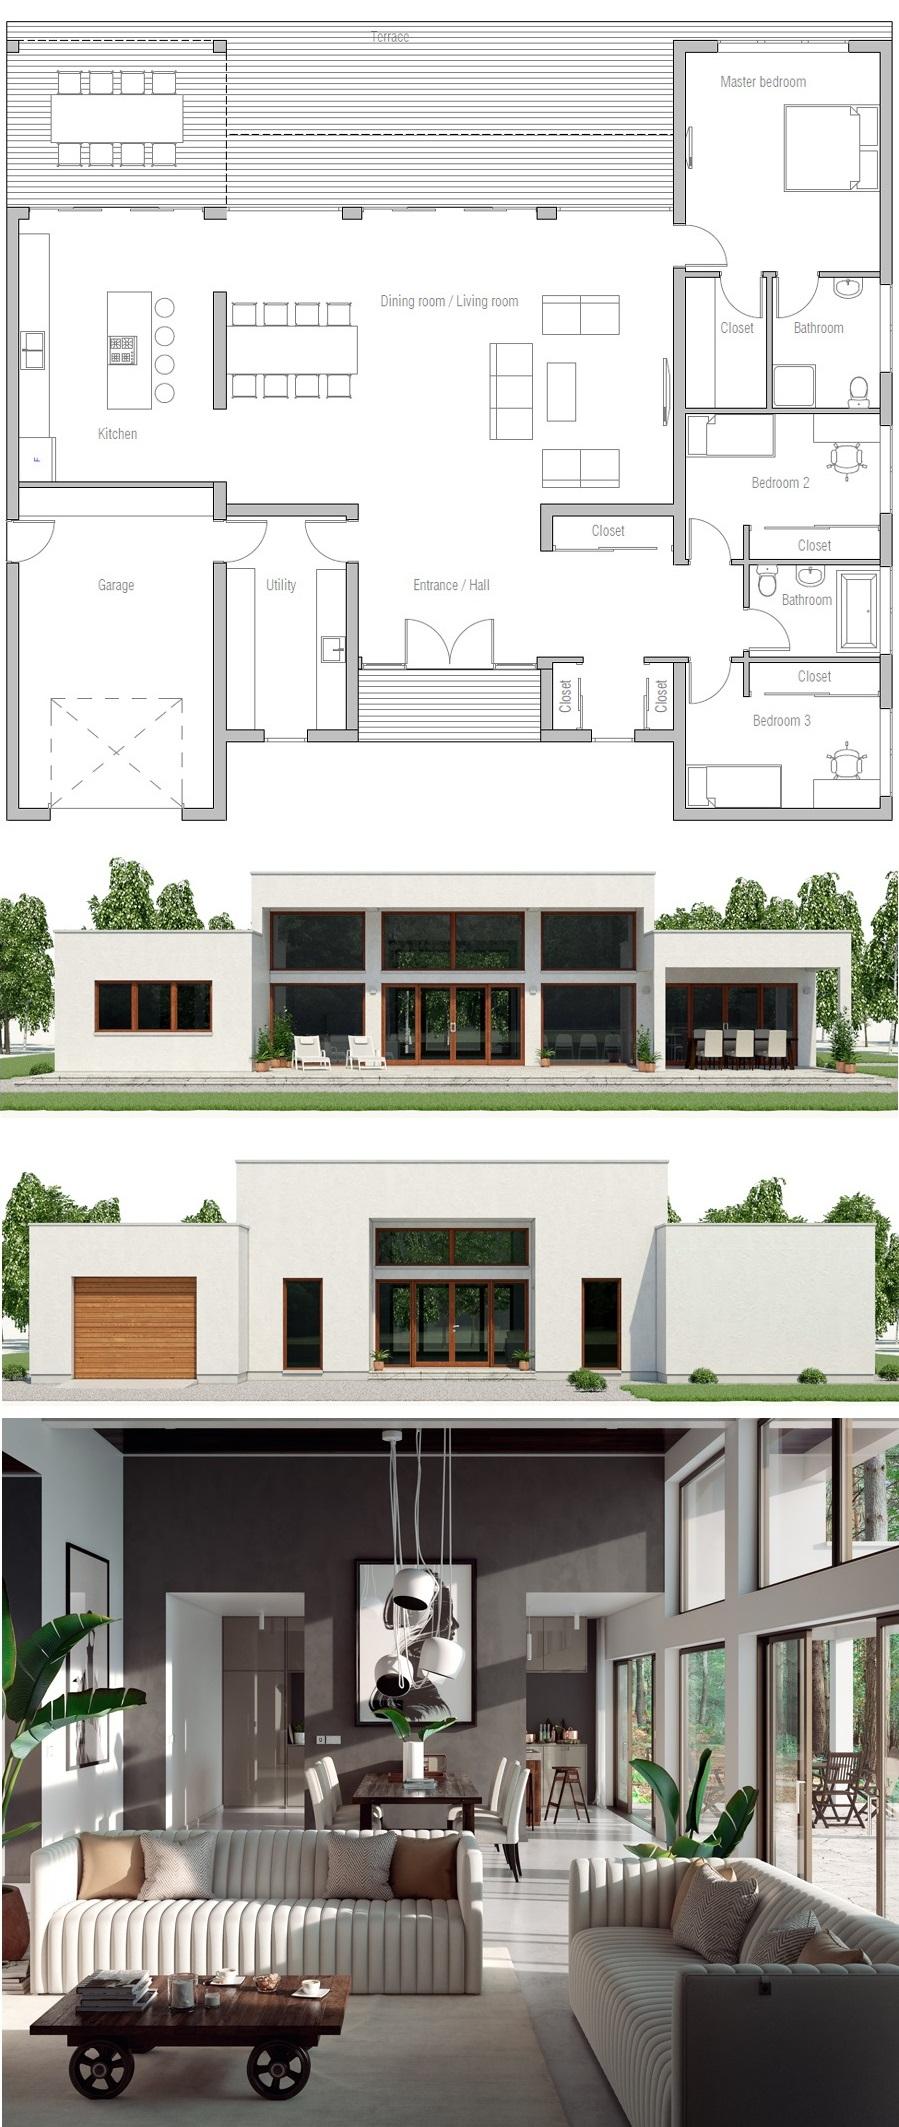 Glass House 70 Log Cabin Kontio Tiny House Cabin House Plans House Floor Plans